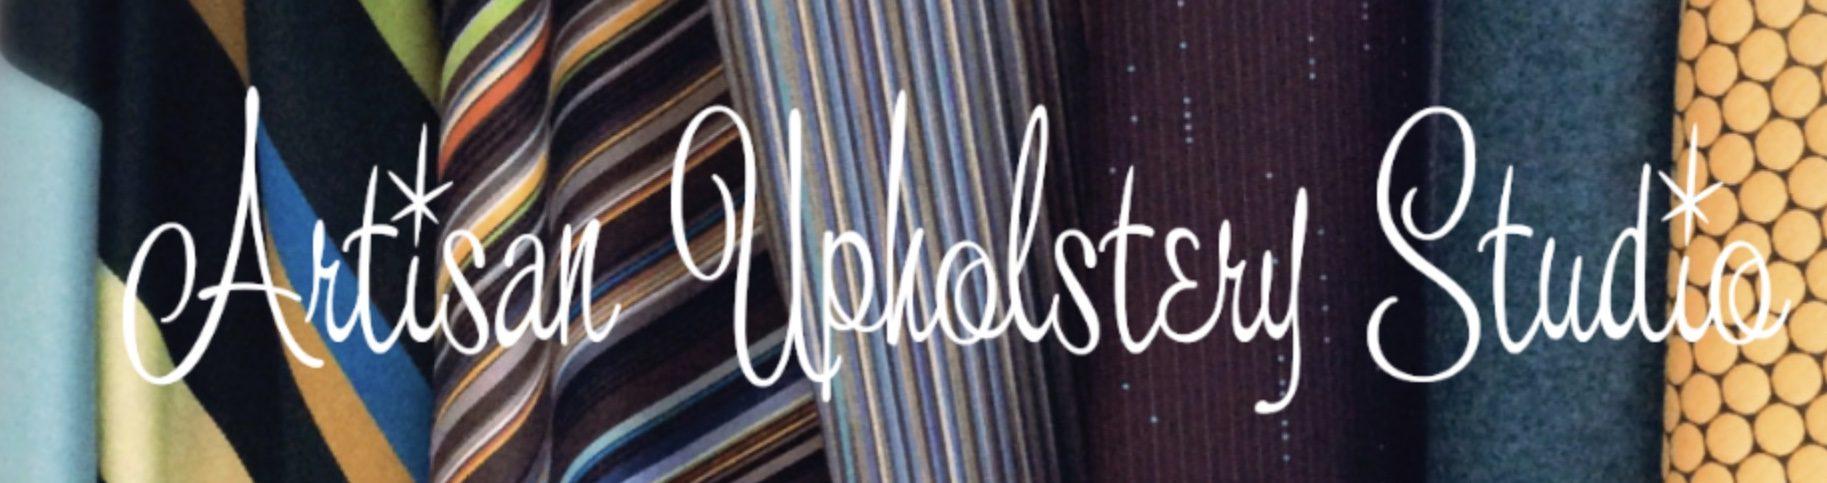 Artisan Upholstery Studio